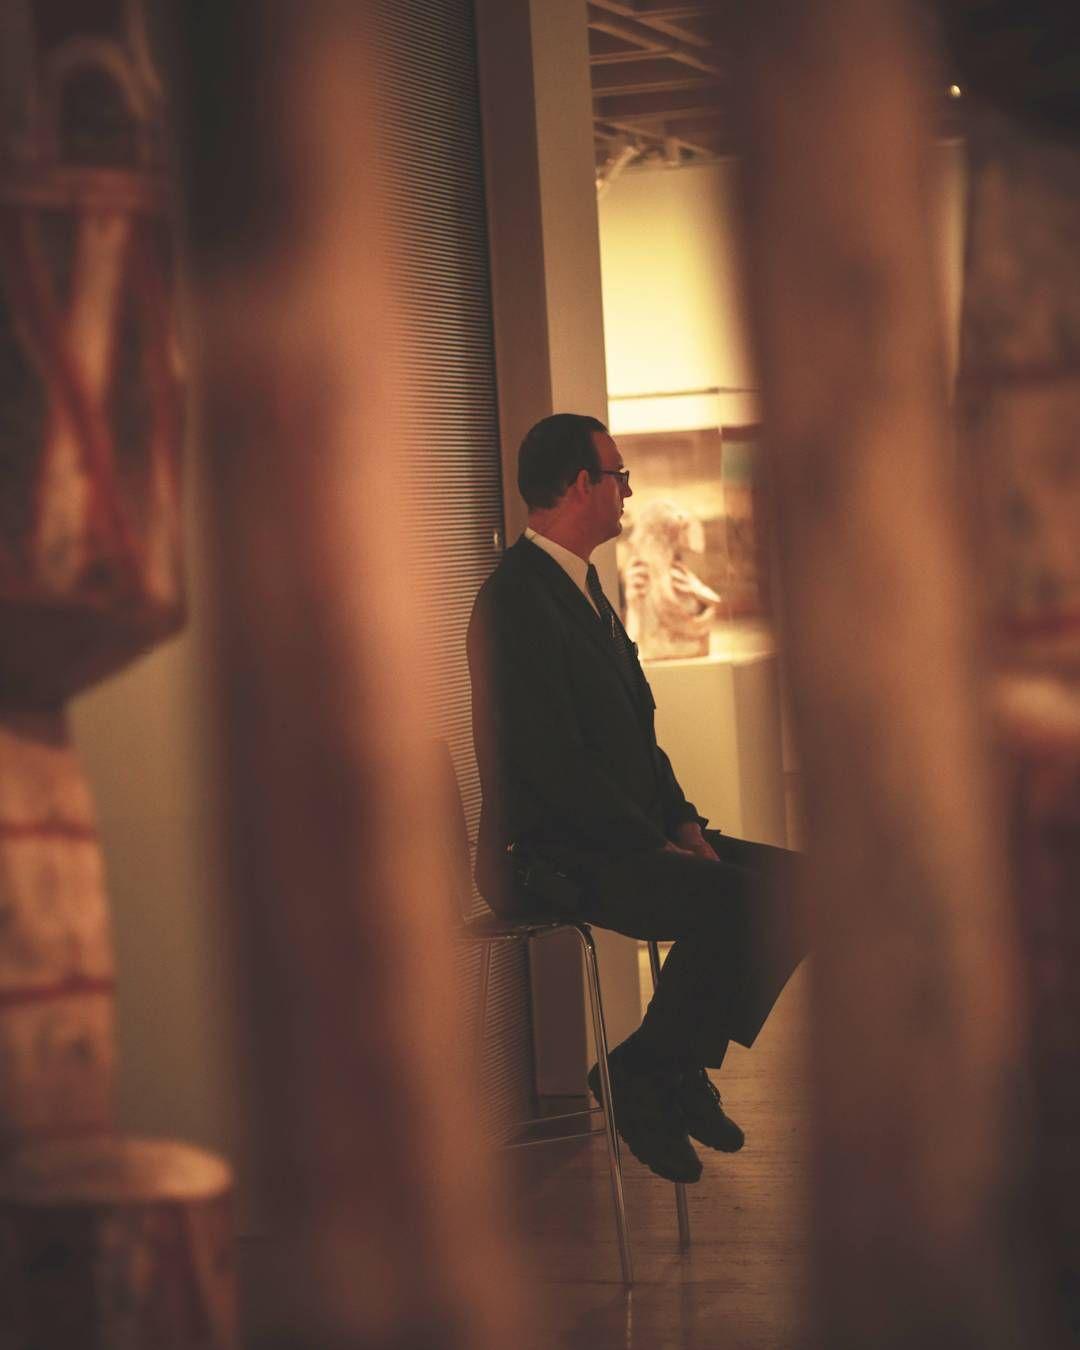 You are under surveillance. #artofvisuals #igerssydney #art #he by mahbubzaman http://www.australiaunwrapped.com/ #AustraliaUnwrapped